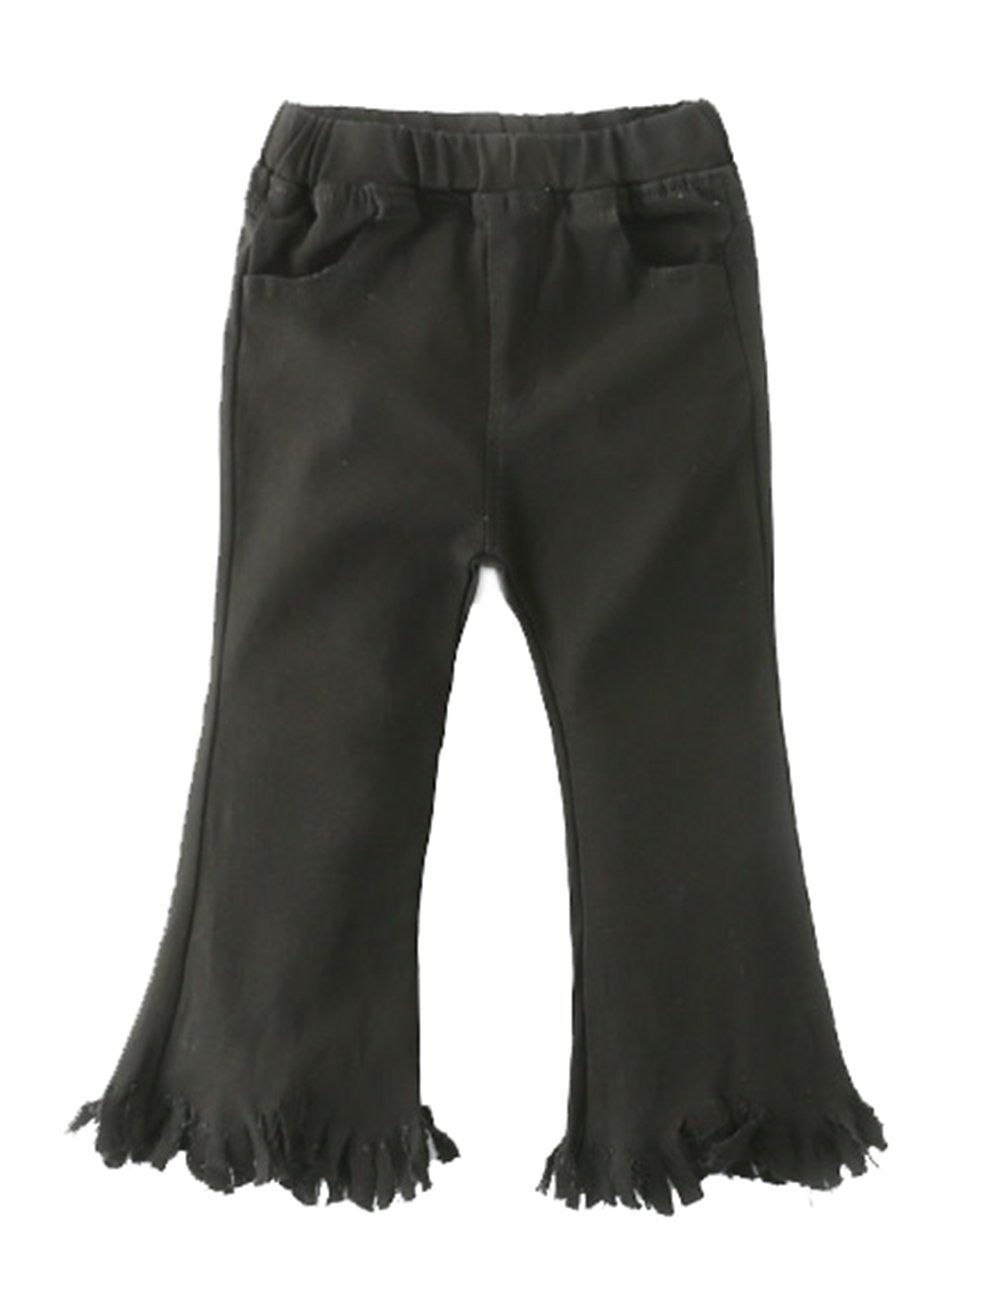 stylesilove Kids Girl Stretchy Pants with Frayed Hem (140/7-8 Years, Black)